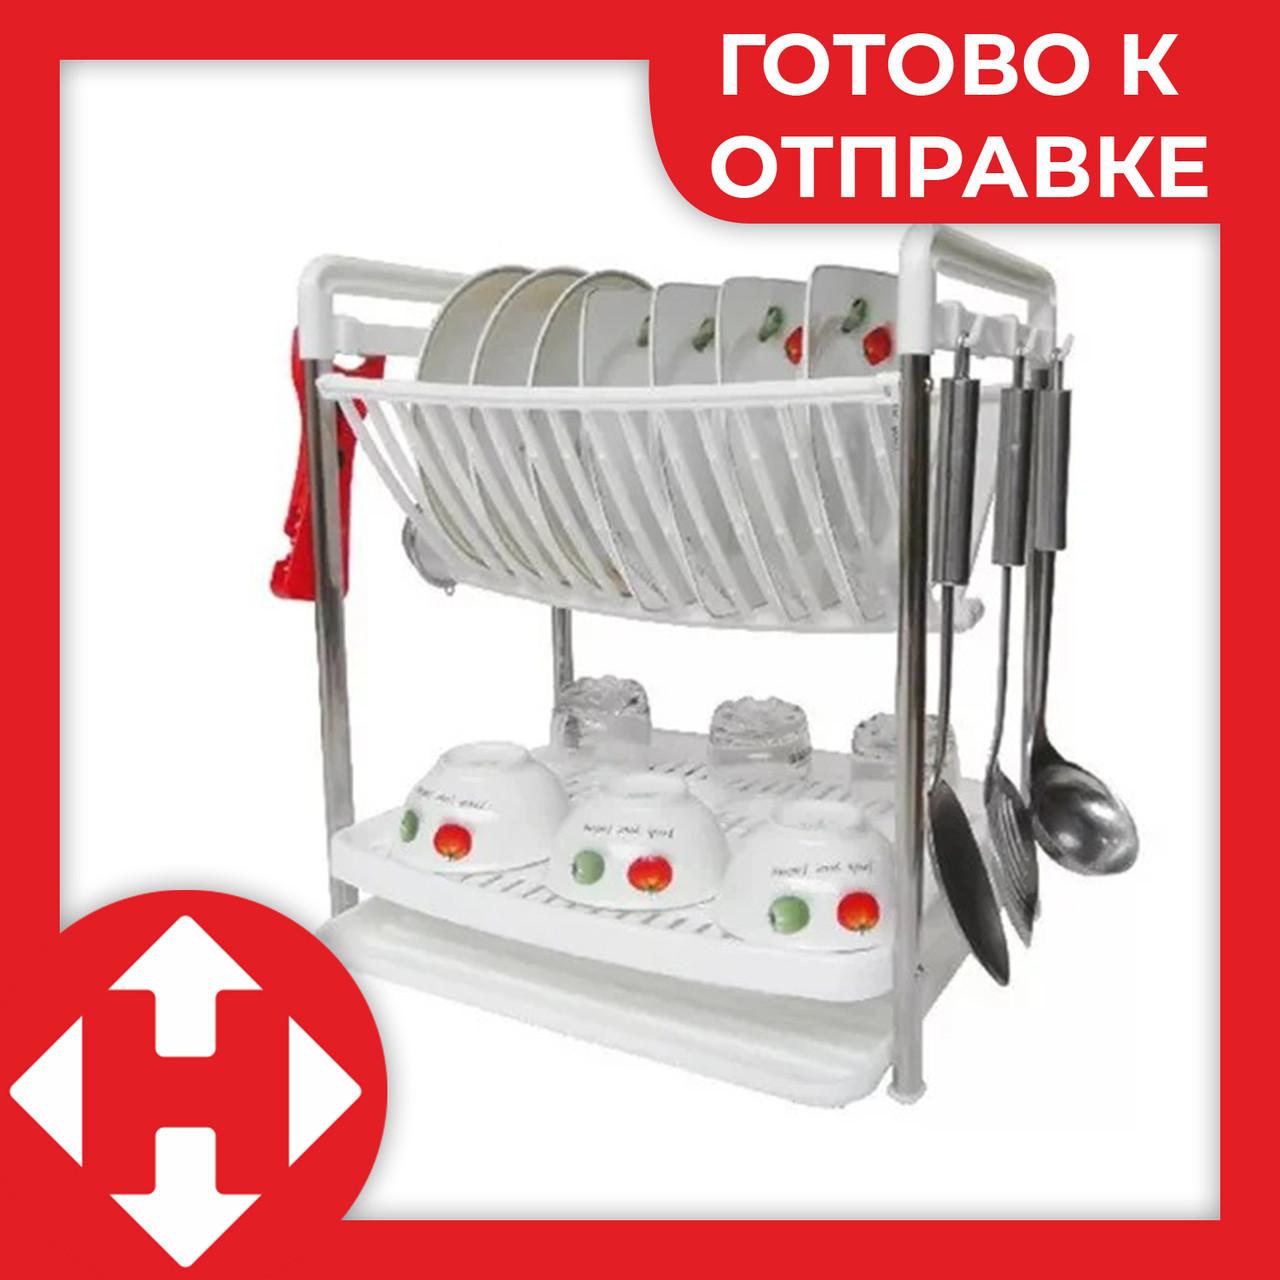 Настольная двухъярусная подставка сушилка для посуды Multifunktional Dish Rack сушка с поддоном